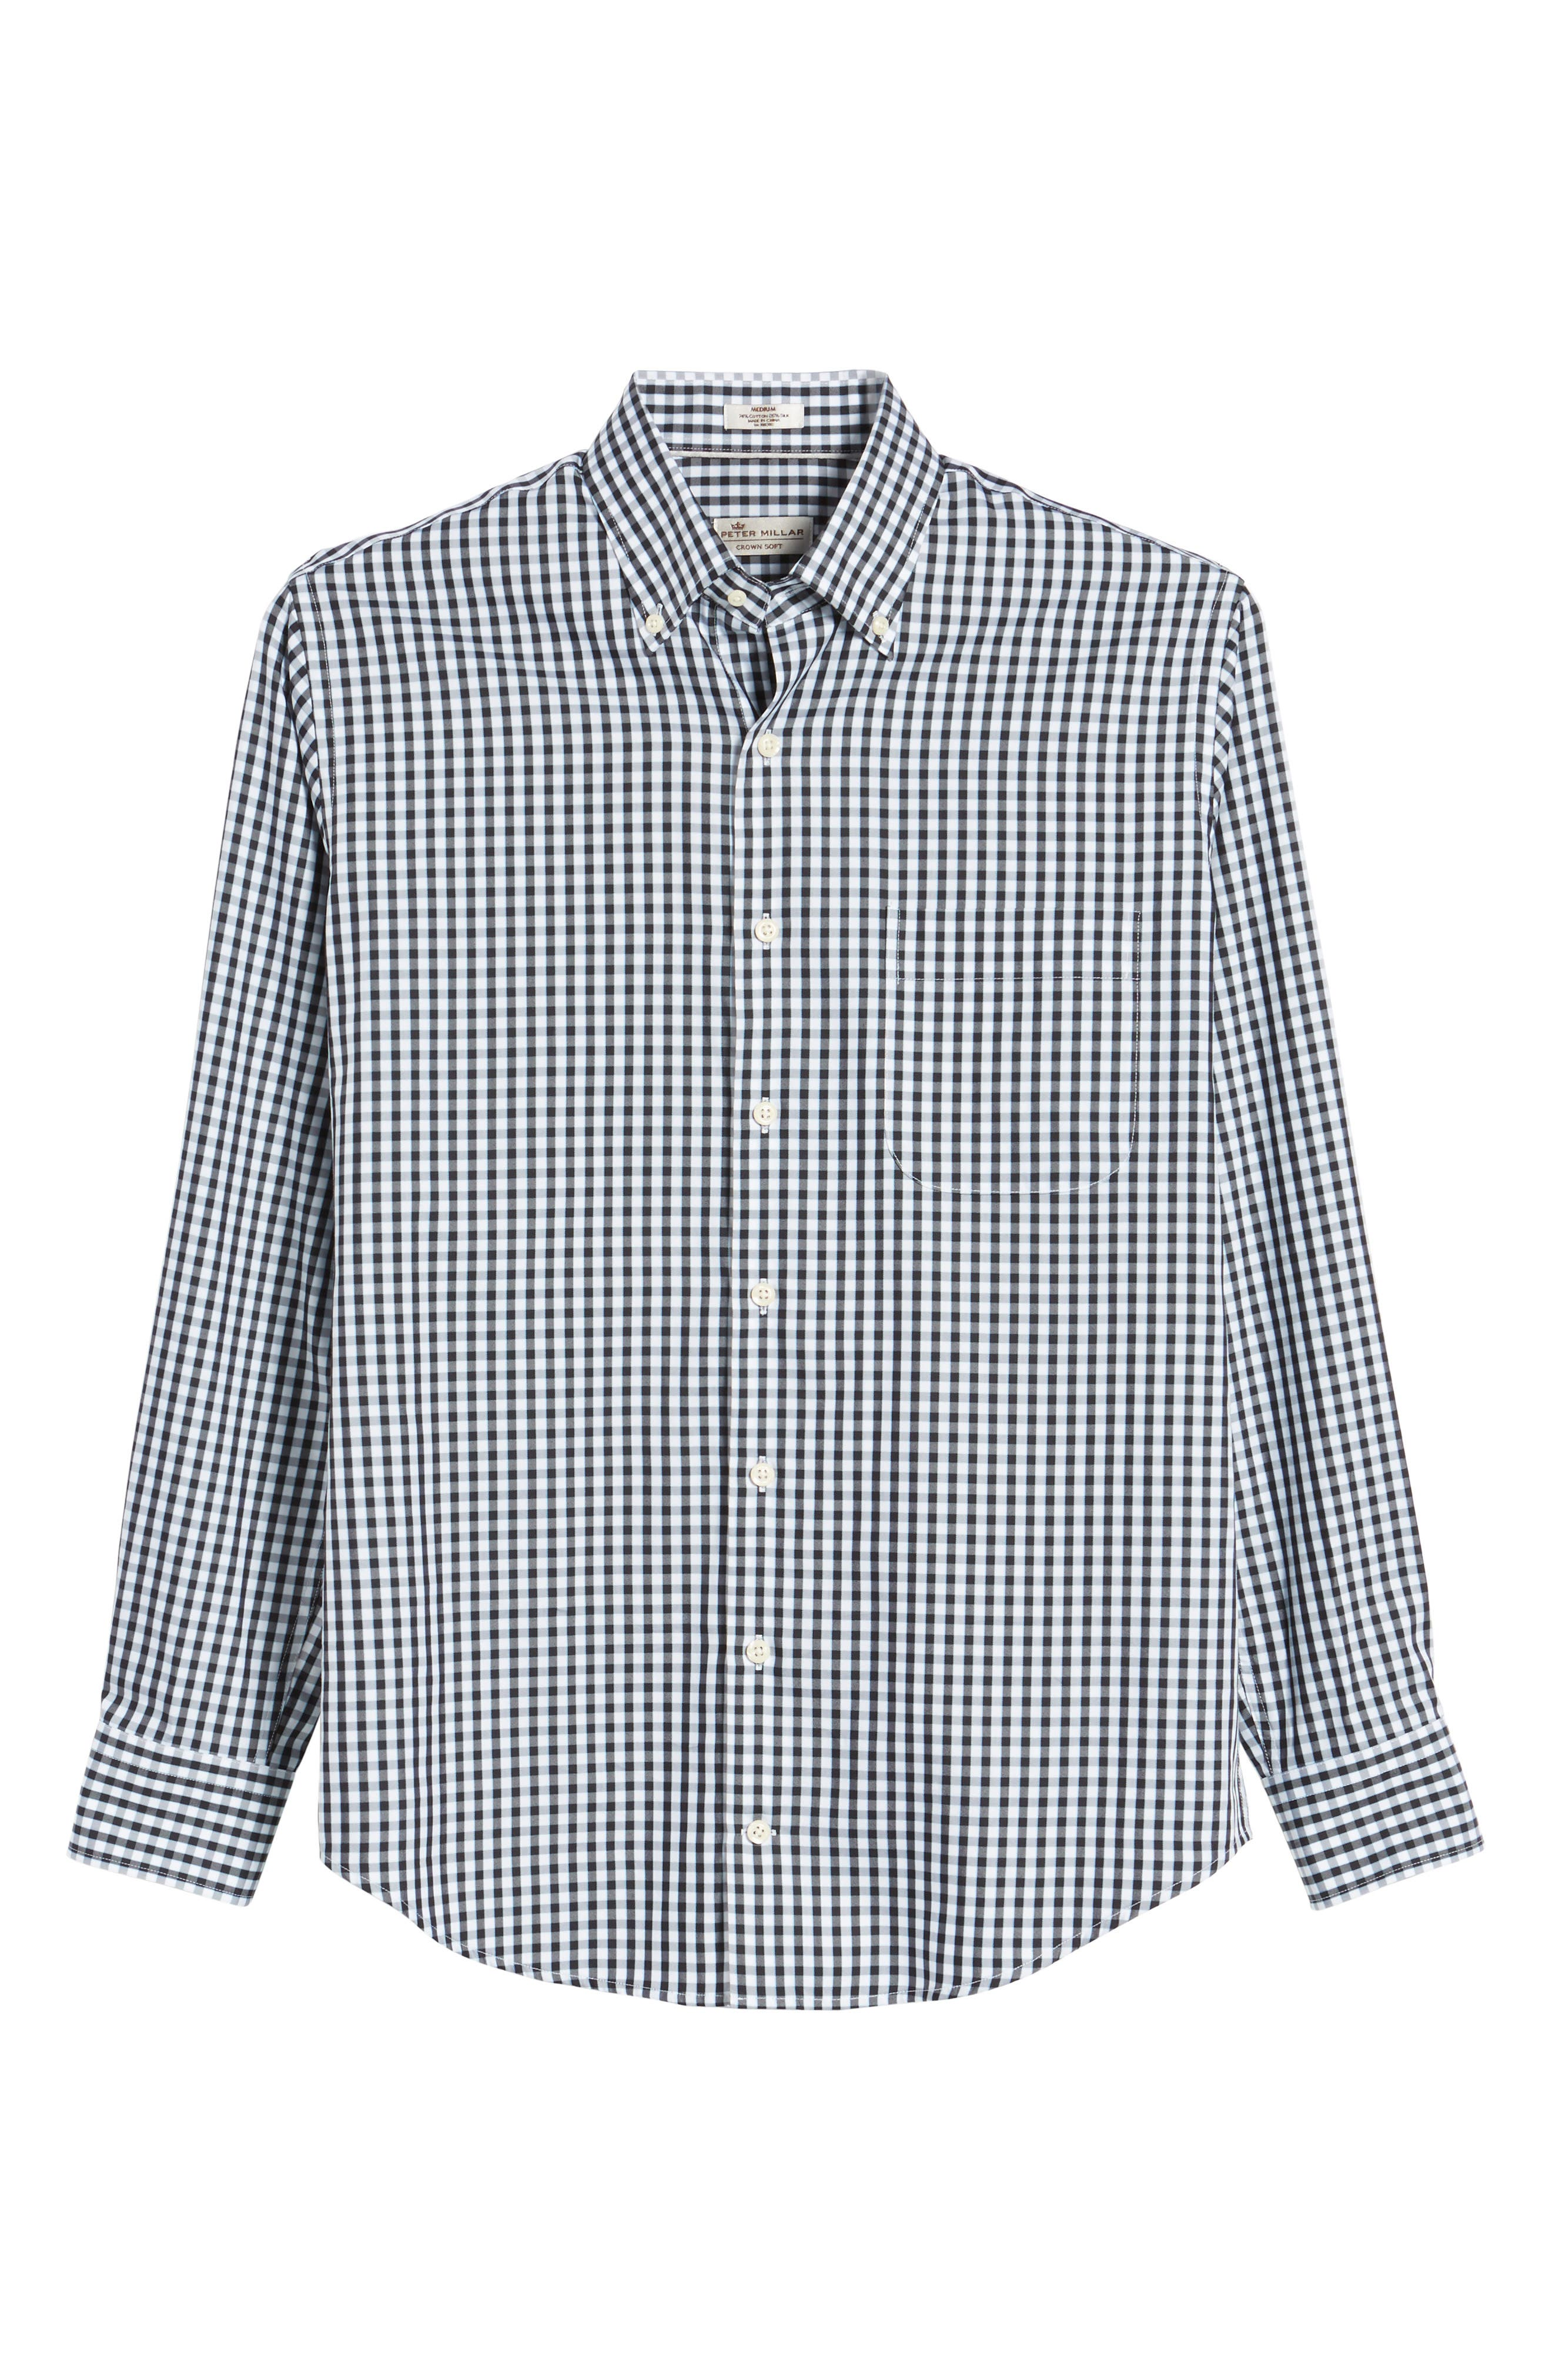 PETER MILLAR, Black Sand Regular Fit Gingham Check Sport Shirt, Alternate thumbnail 6, color, BLACK